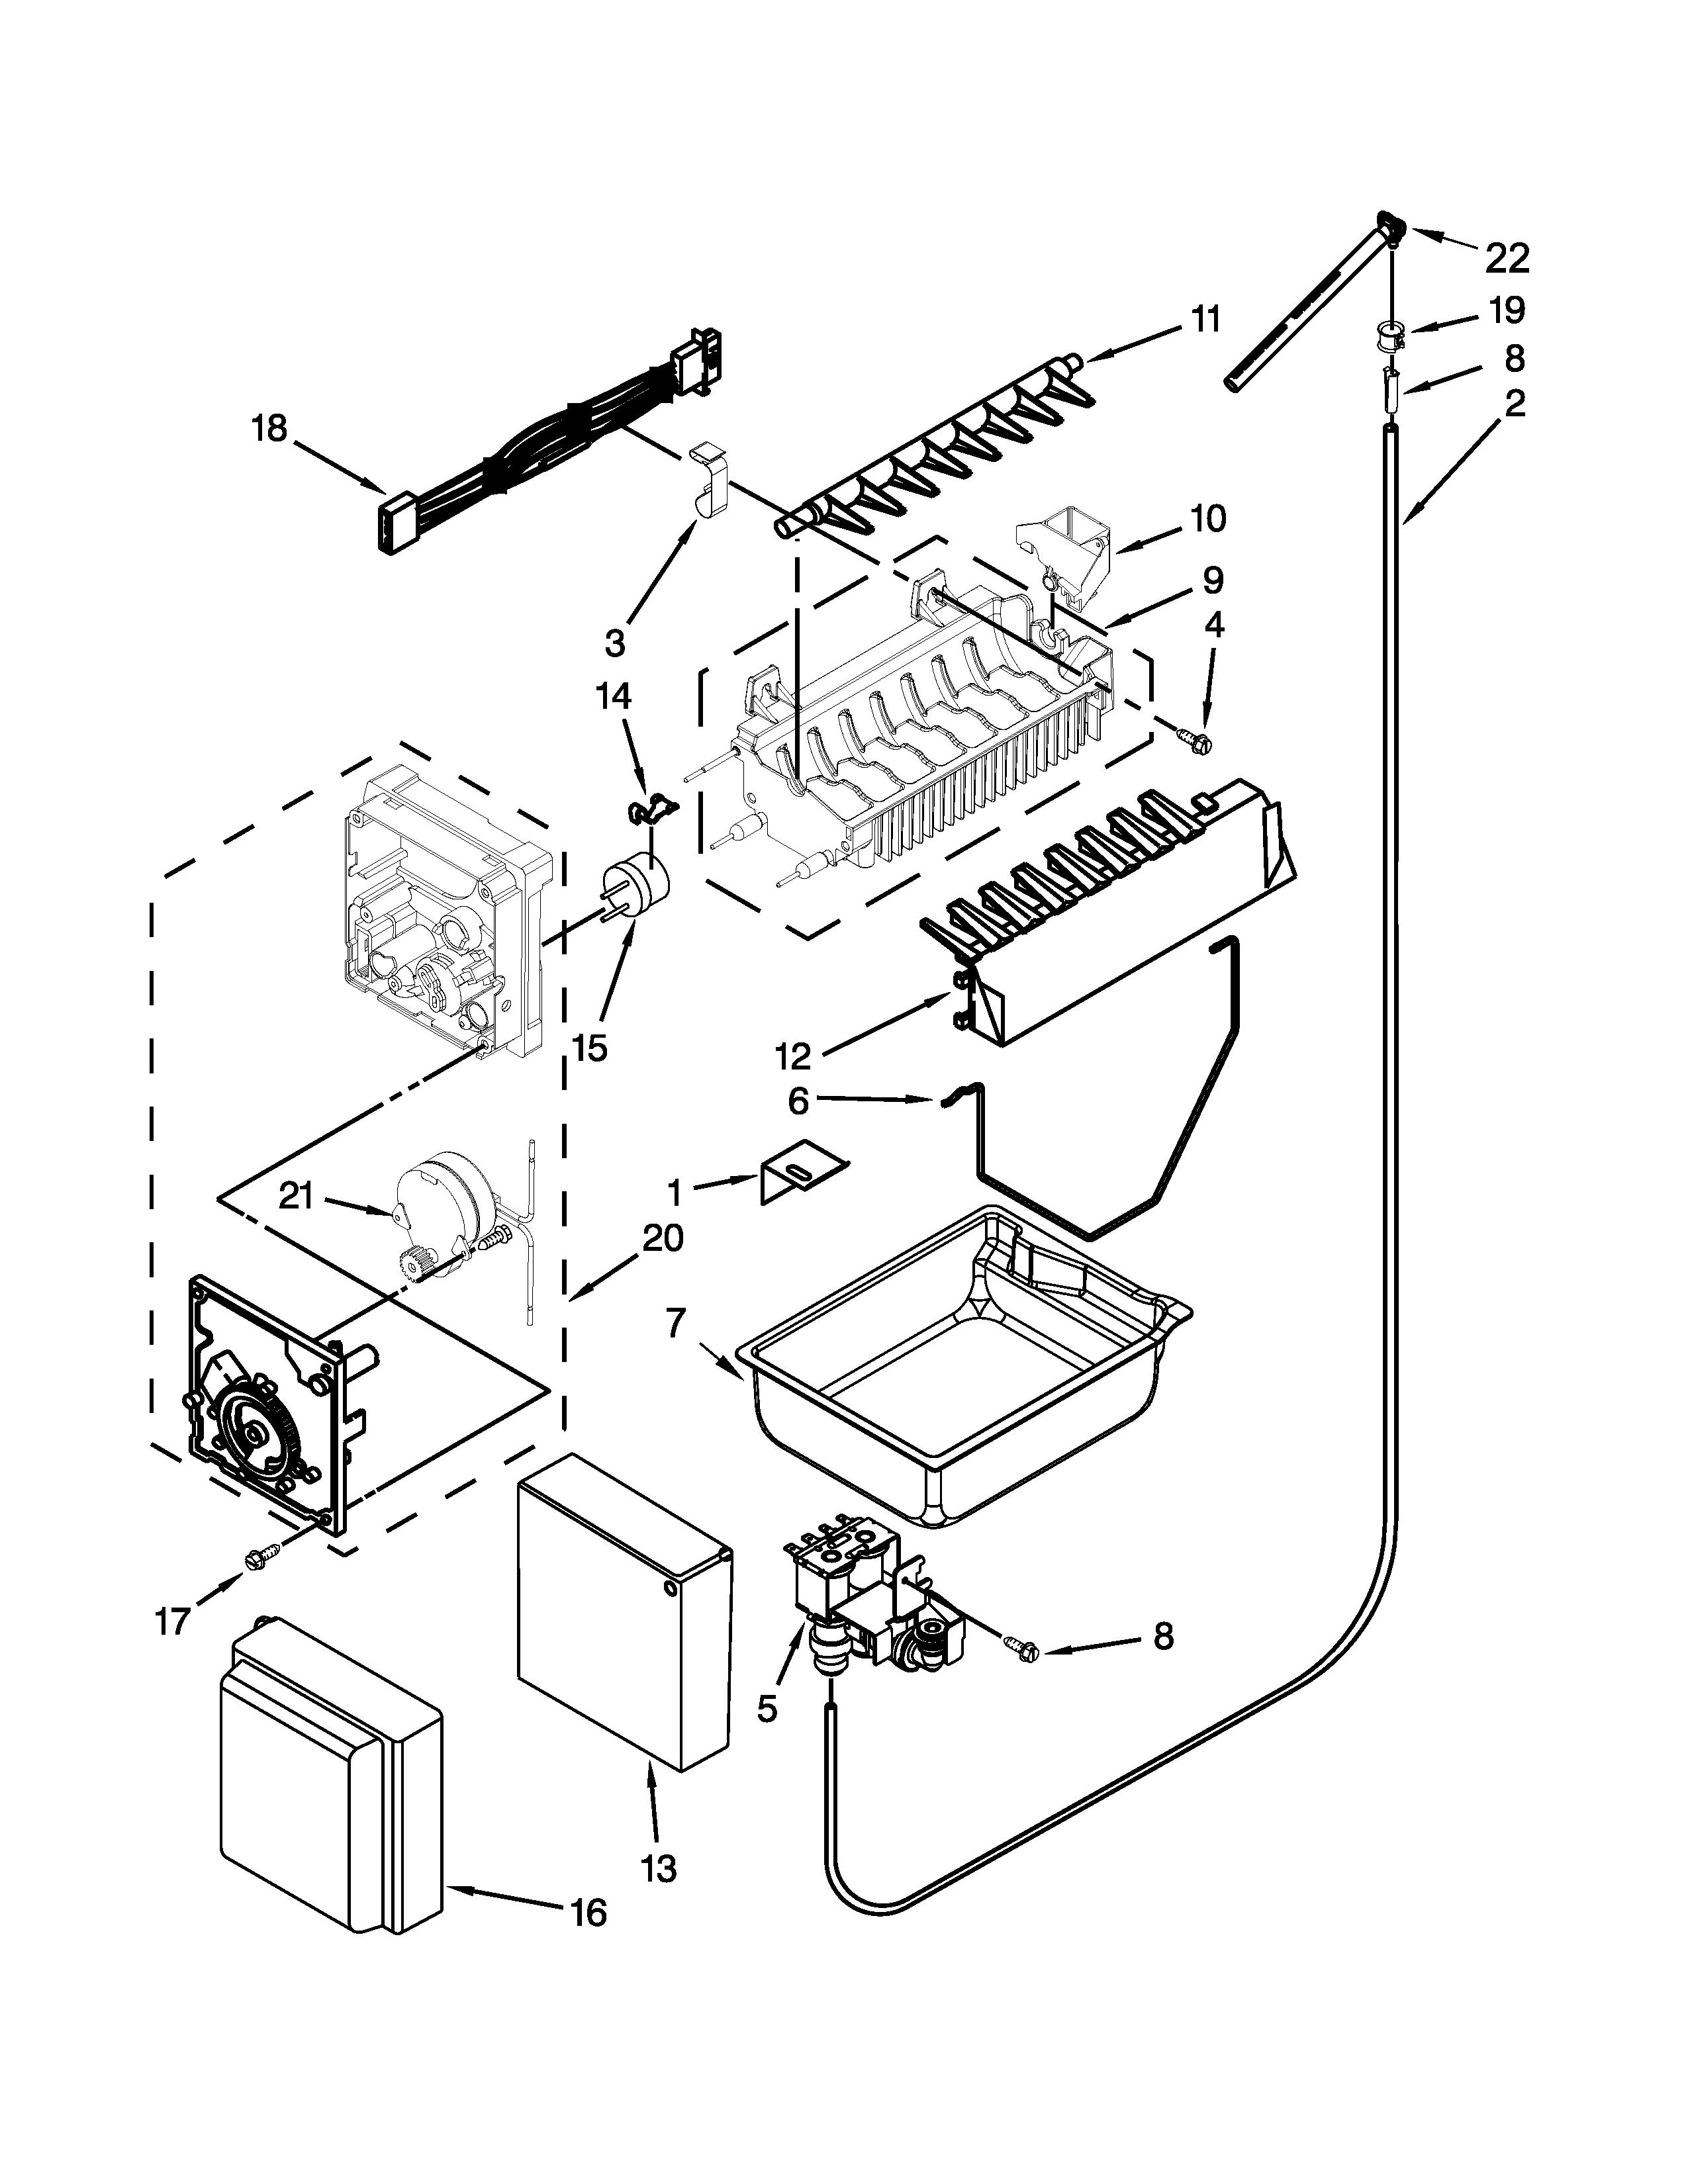 Jenn-Air model JFC2290VEM8 bottom-mount refrigerator